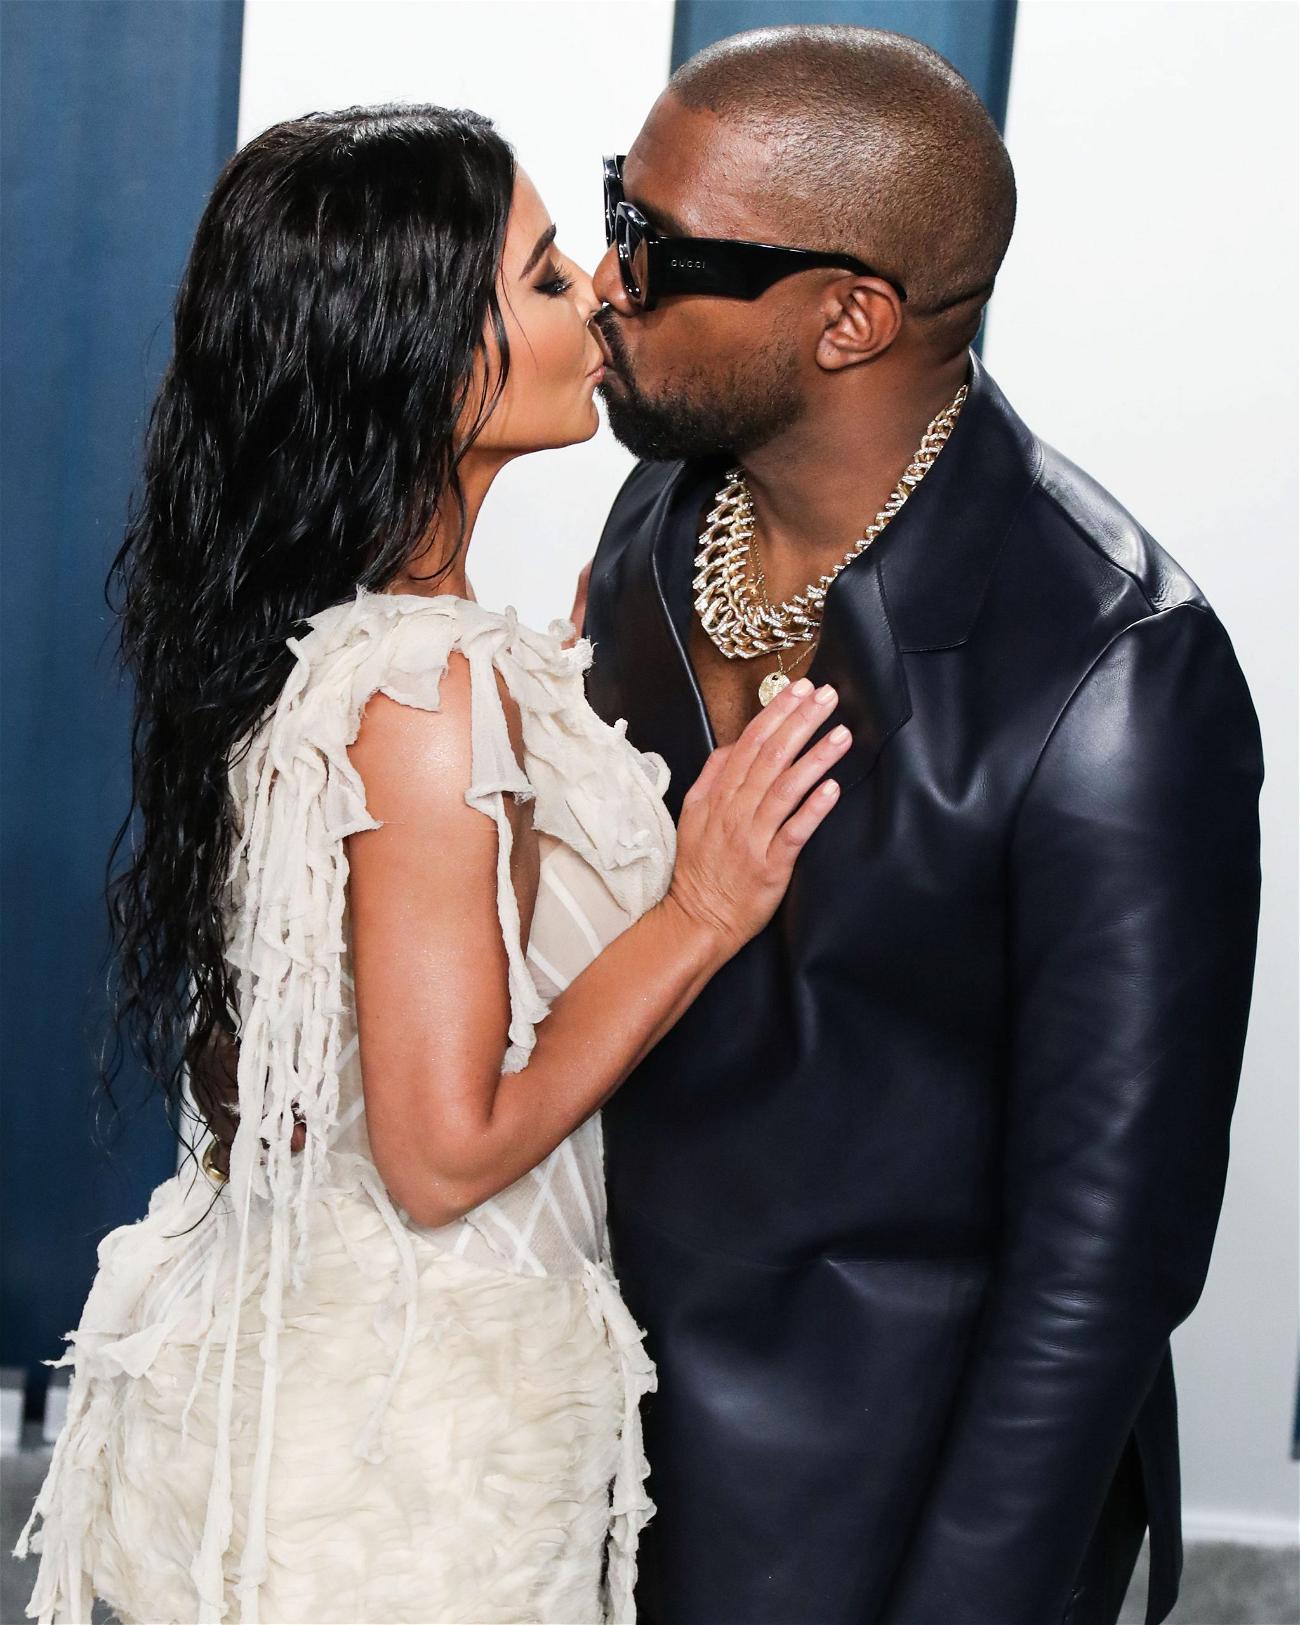 Kim Kardashian Kissing Kanye West